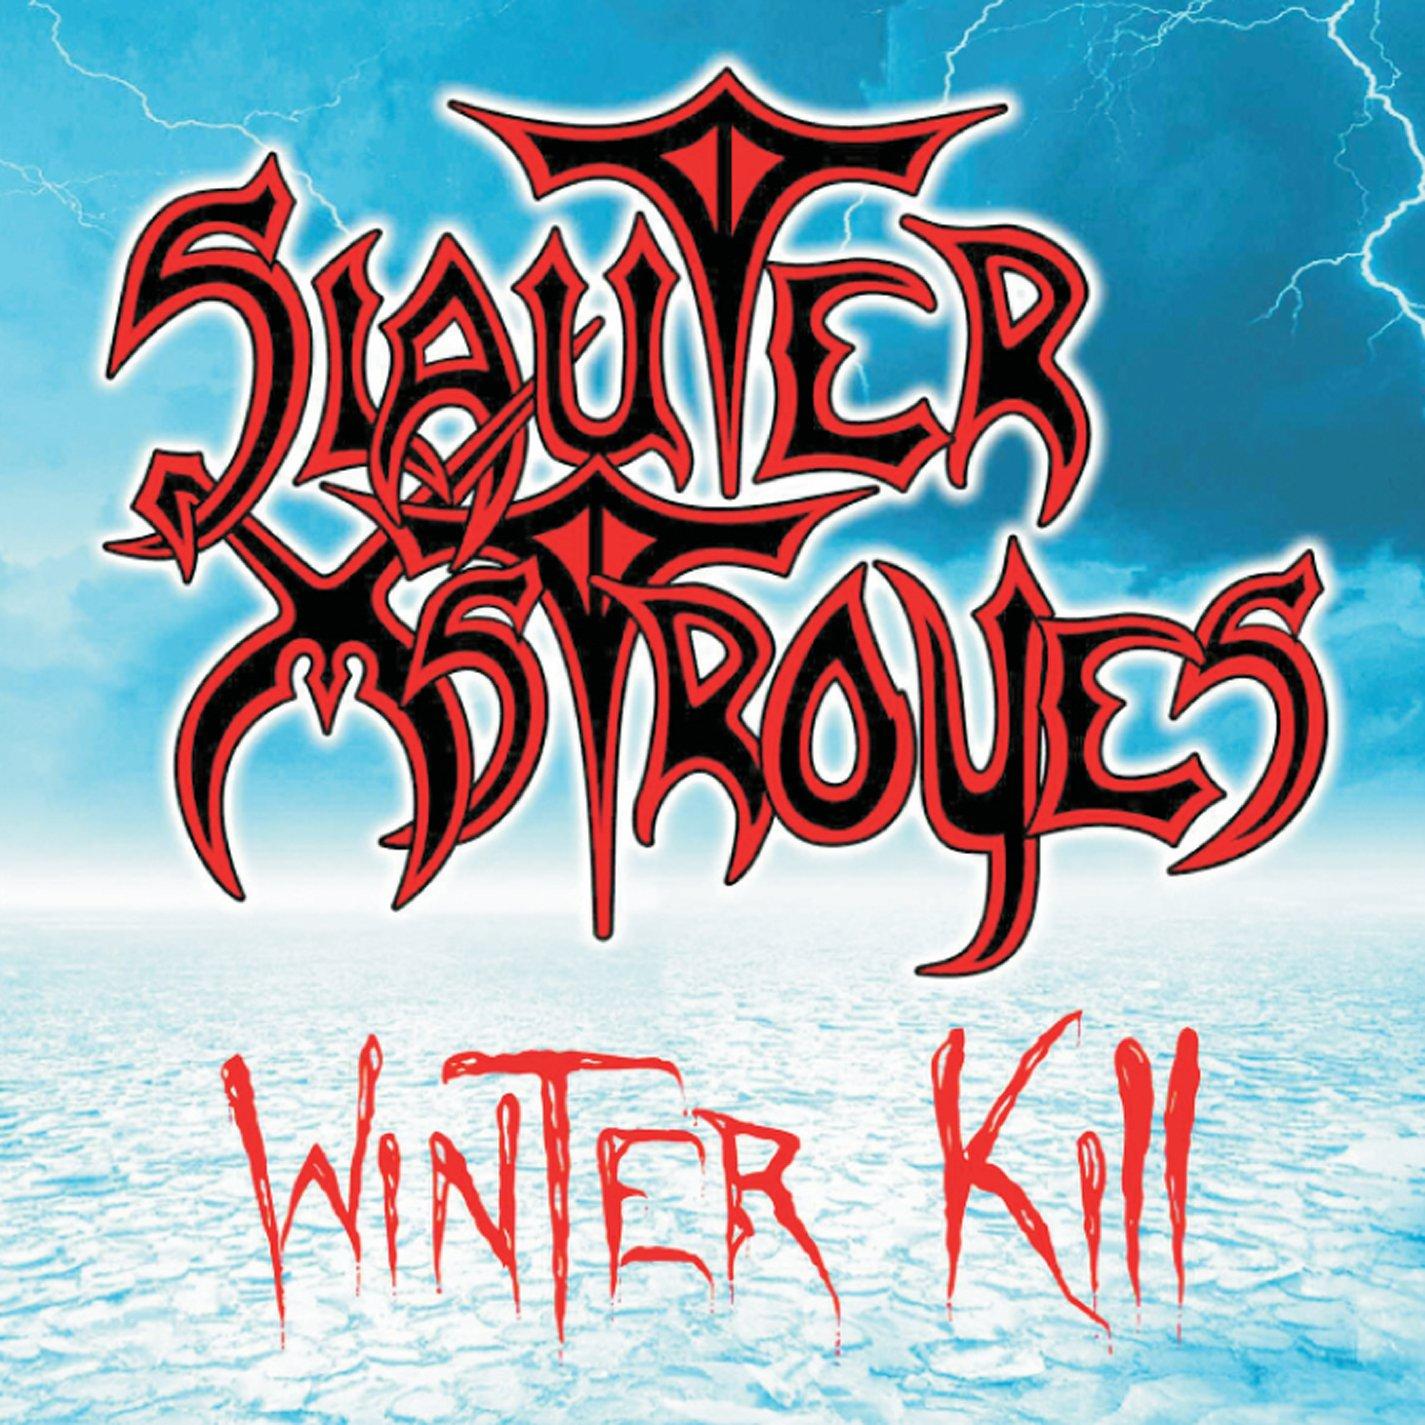 slauter xstroyes winter kill